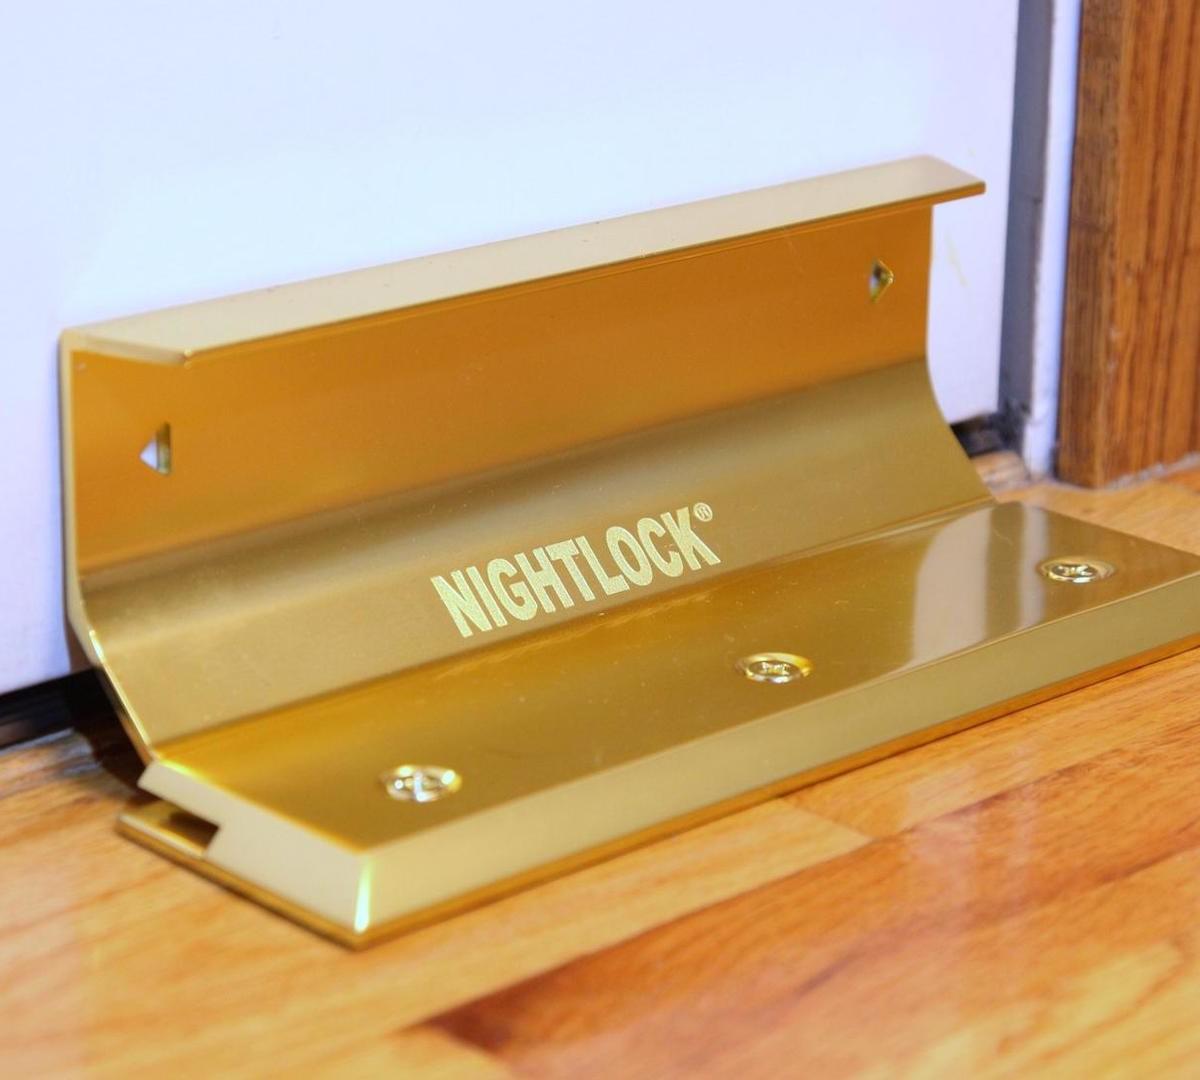 NIGHTLOCK Original door brace can stand up to serious force